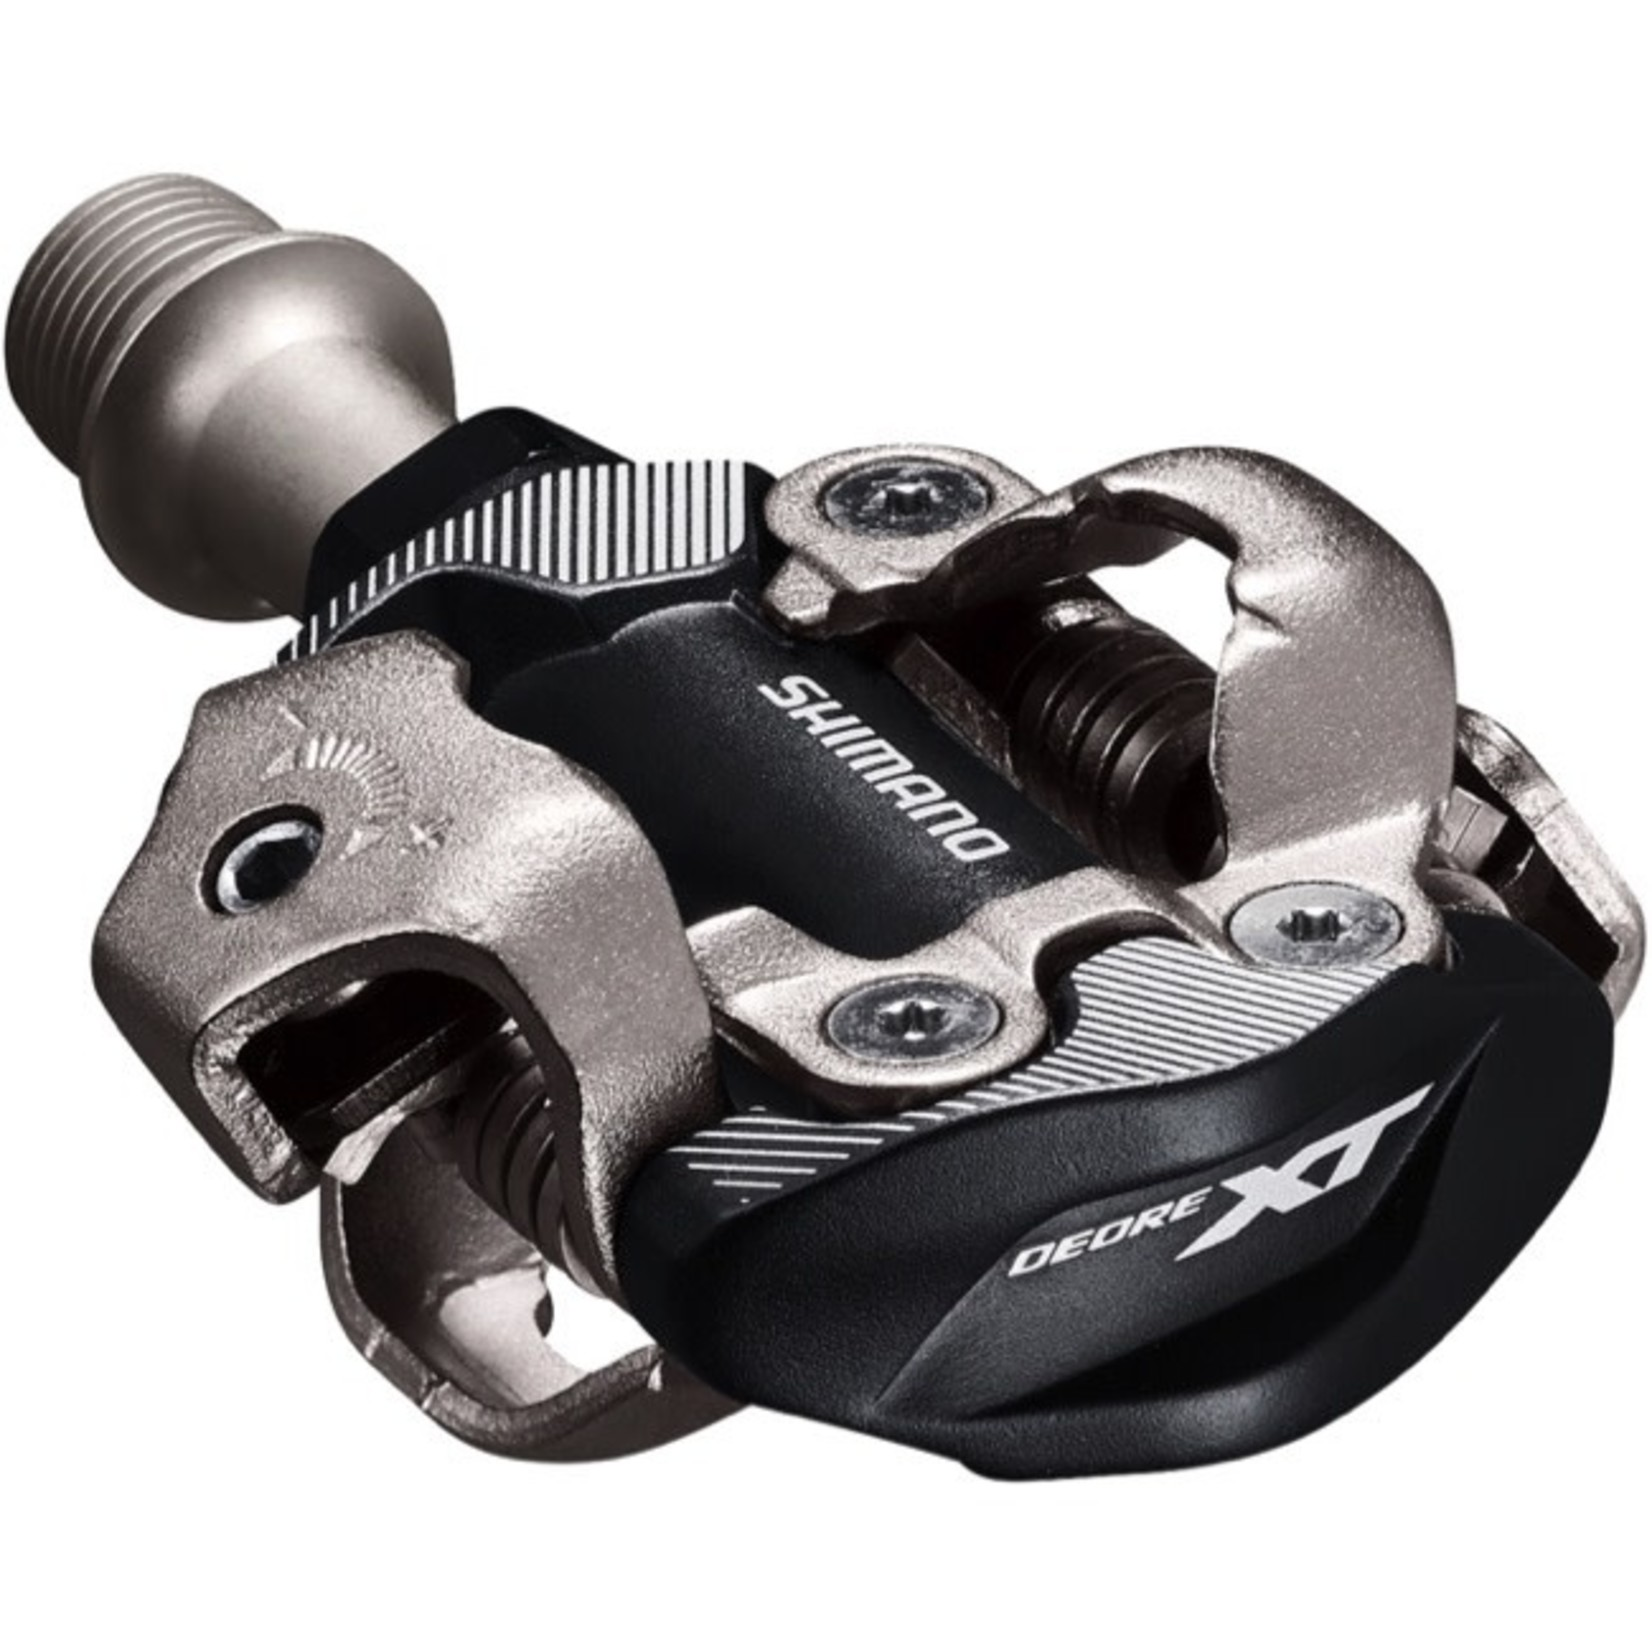 Shimano Shimano Deore XT 8100 SPD Pedals